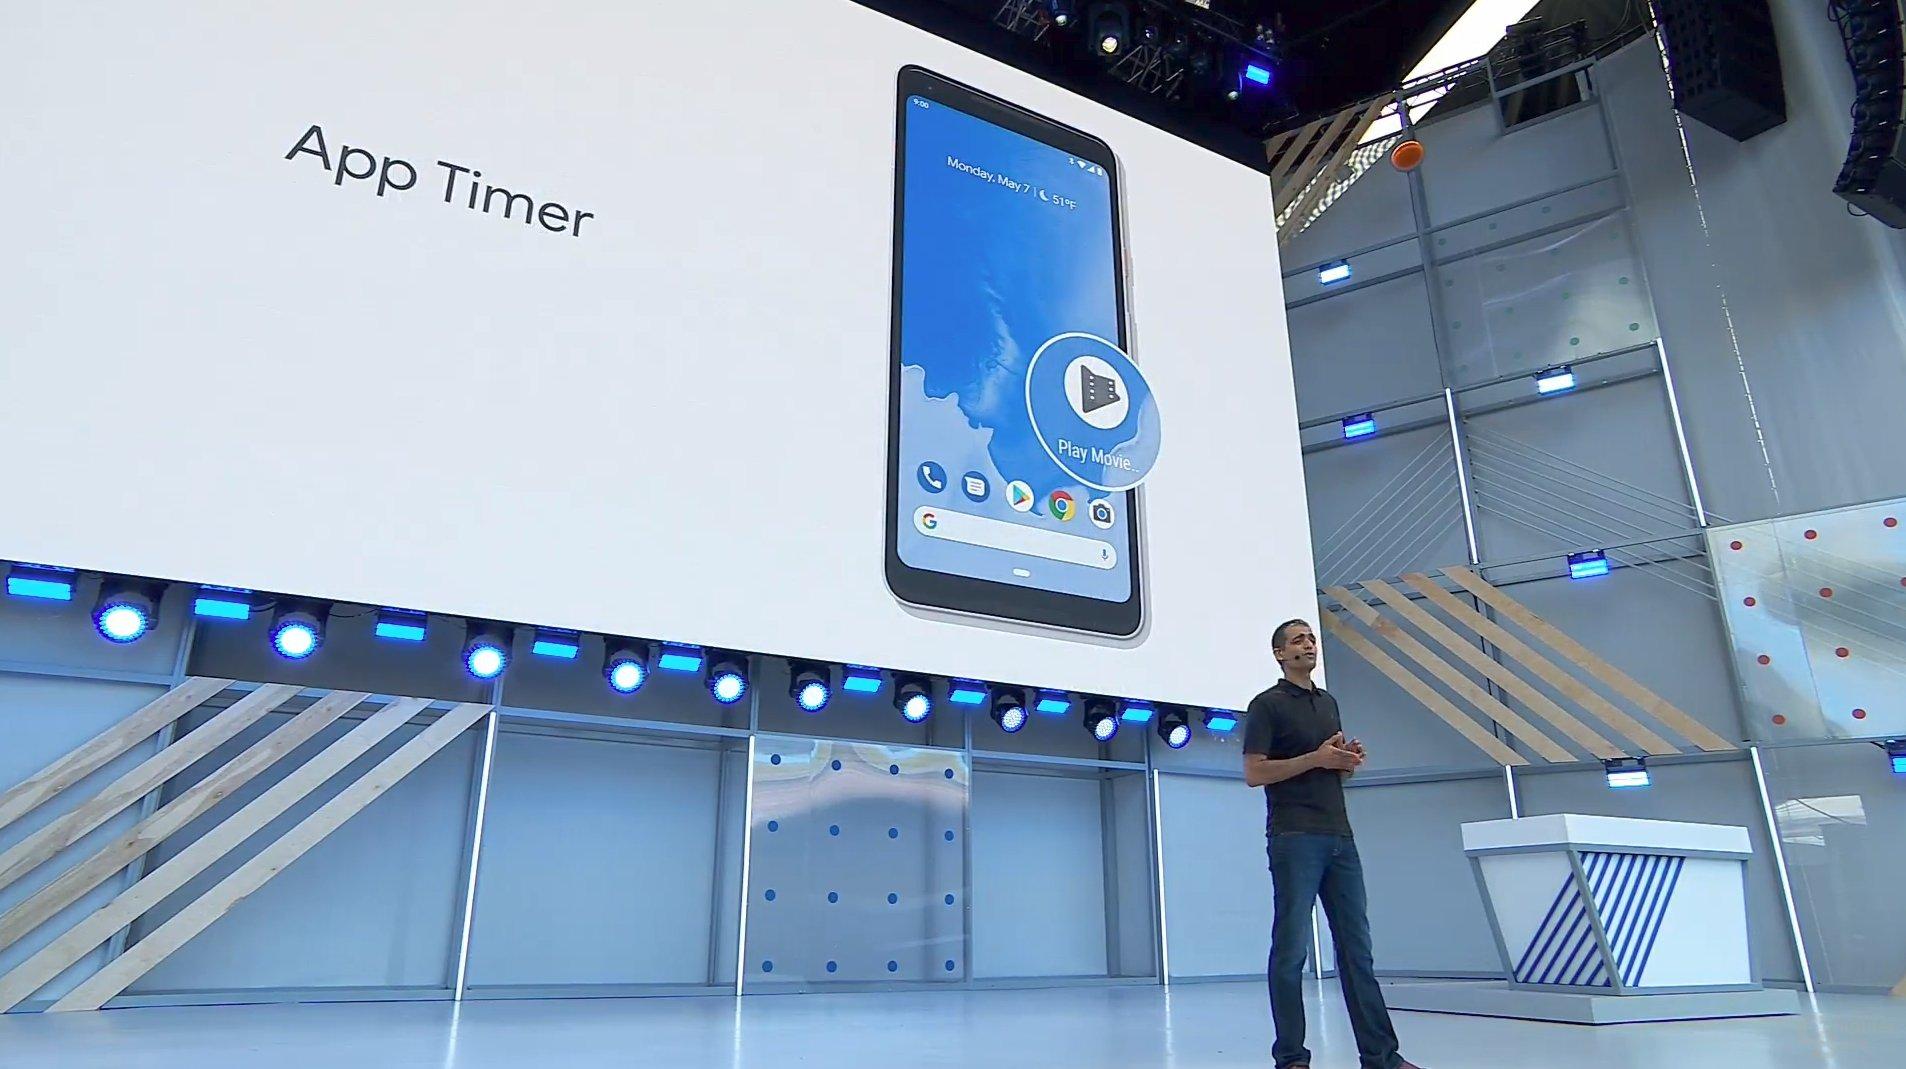 App Timer